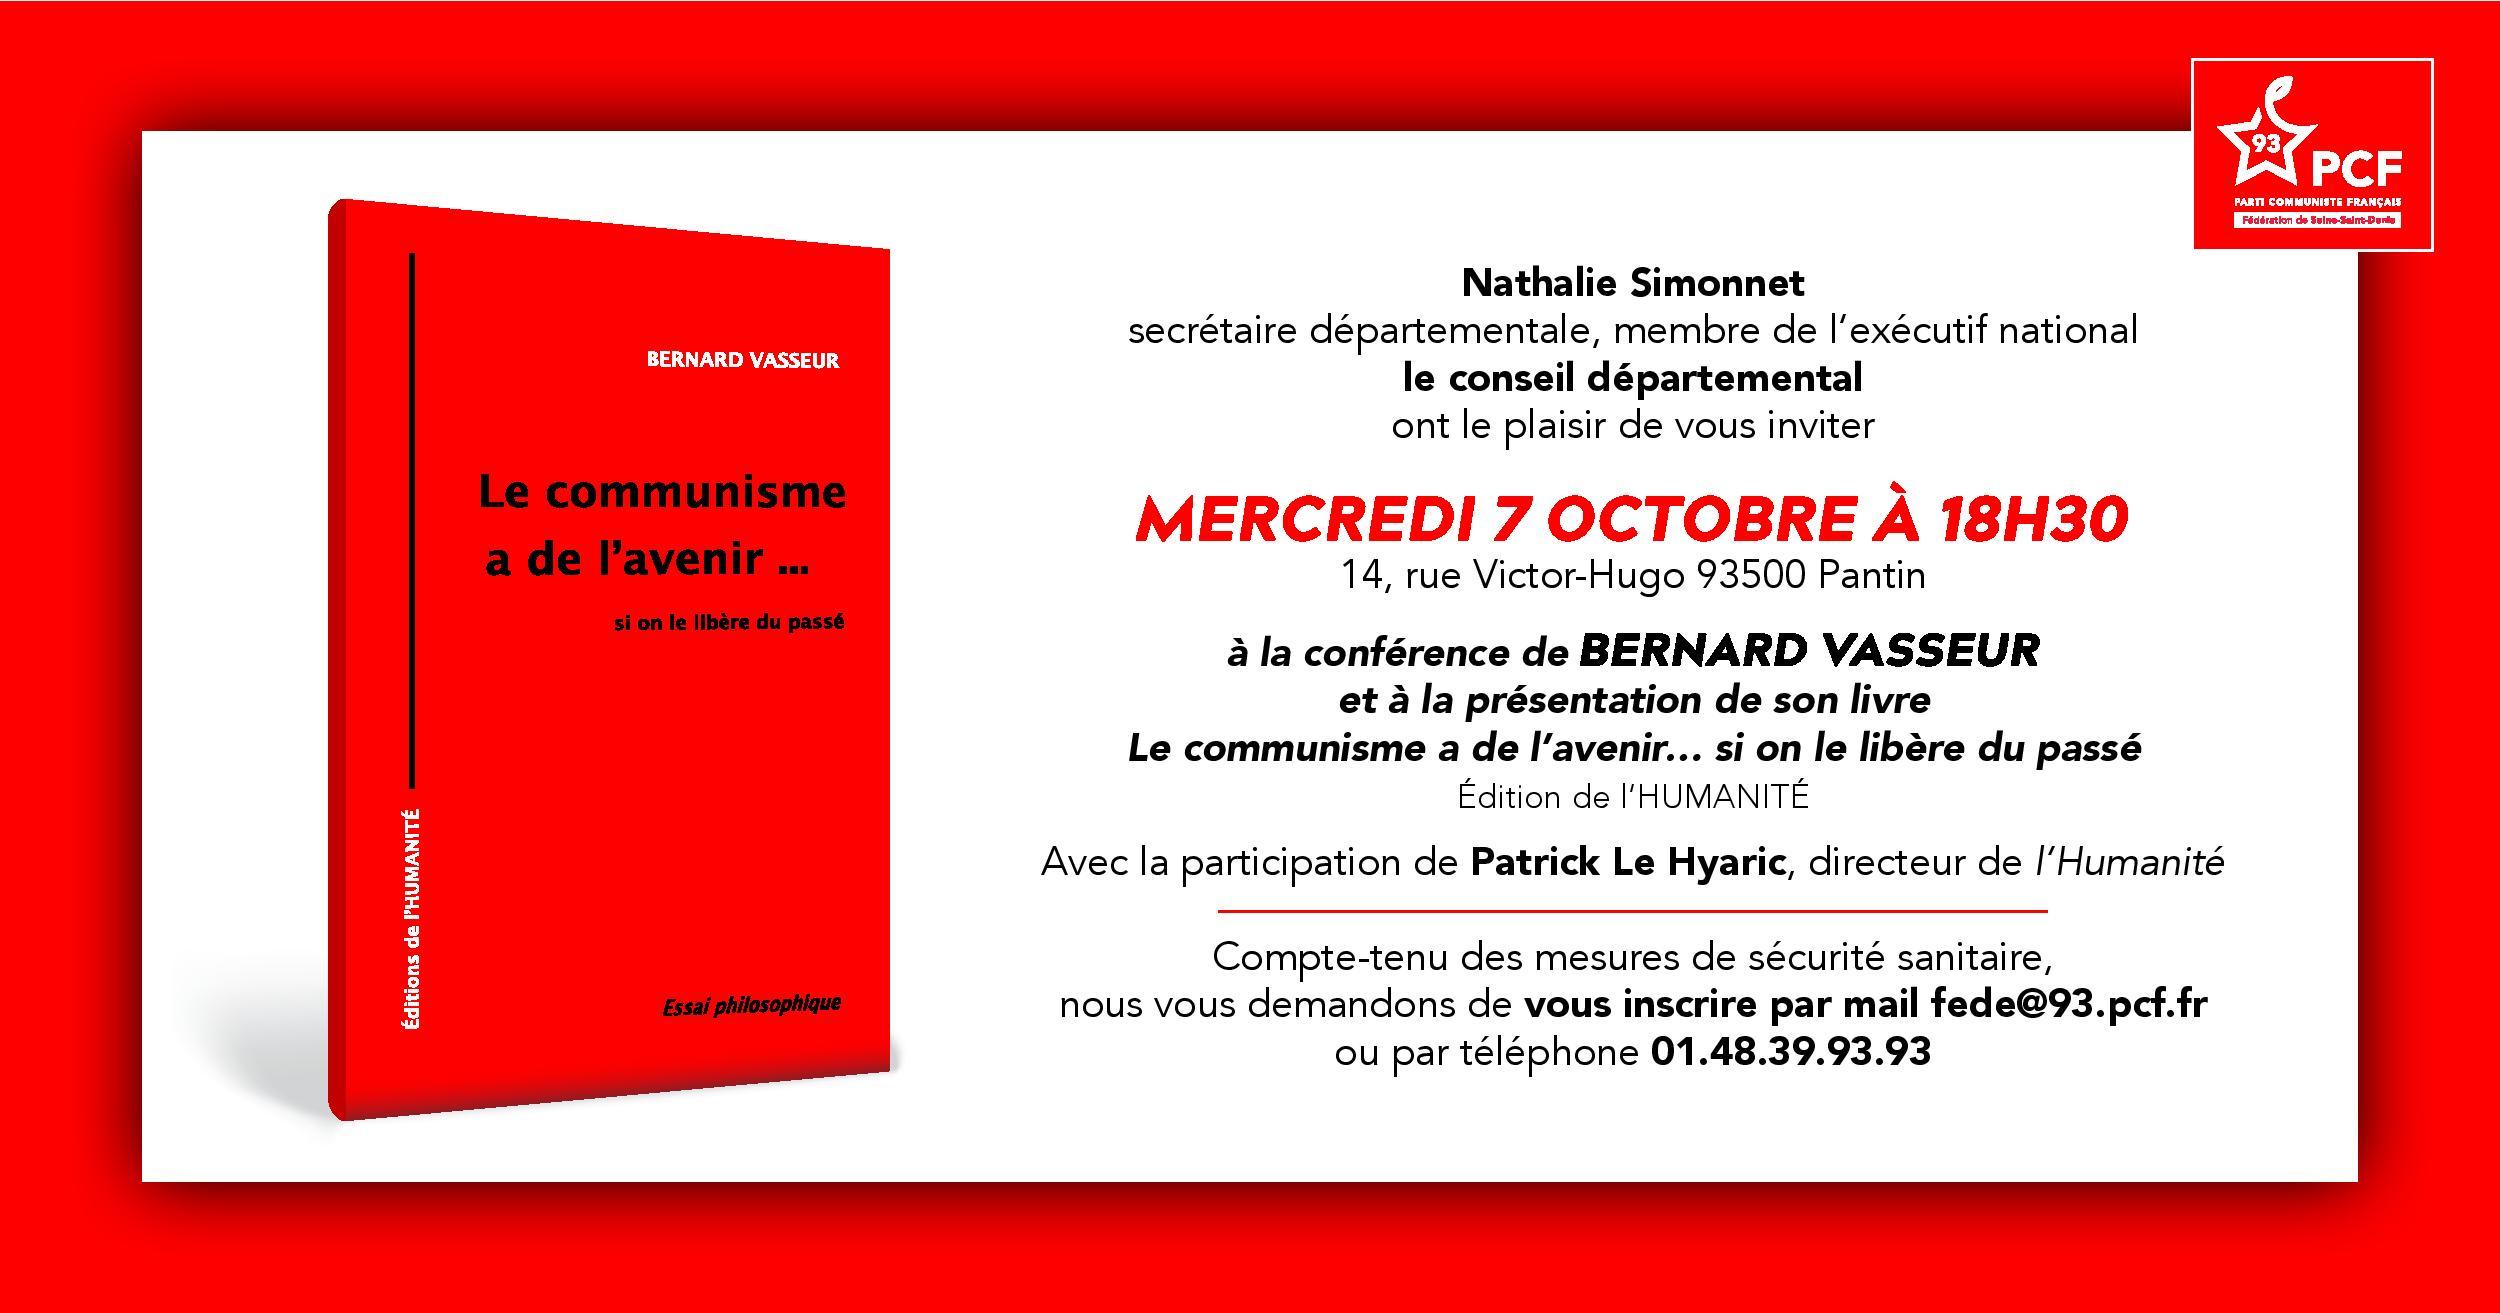 invit_conference_bernard_vasseur-page-001.jpg